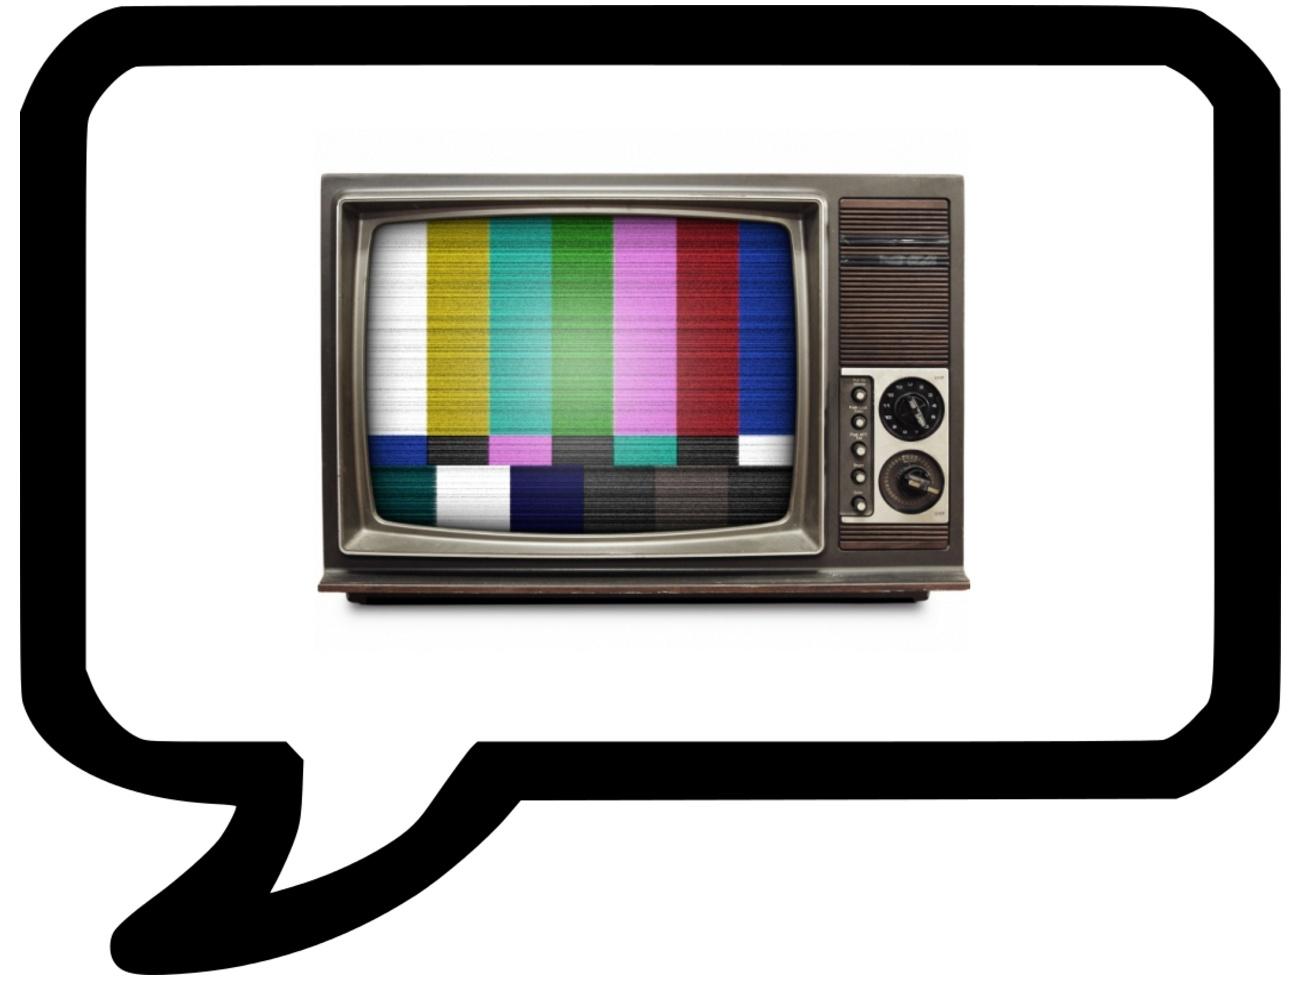 TV_Lingo.jpg